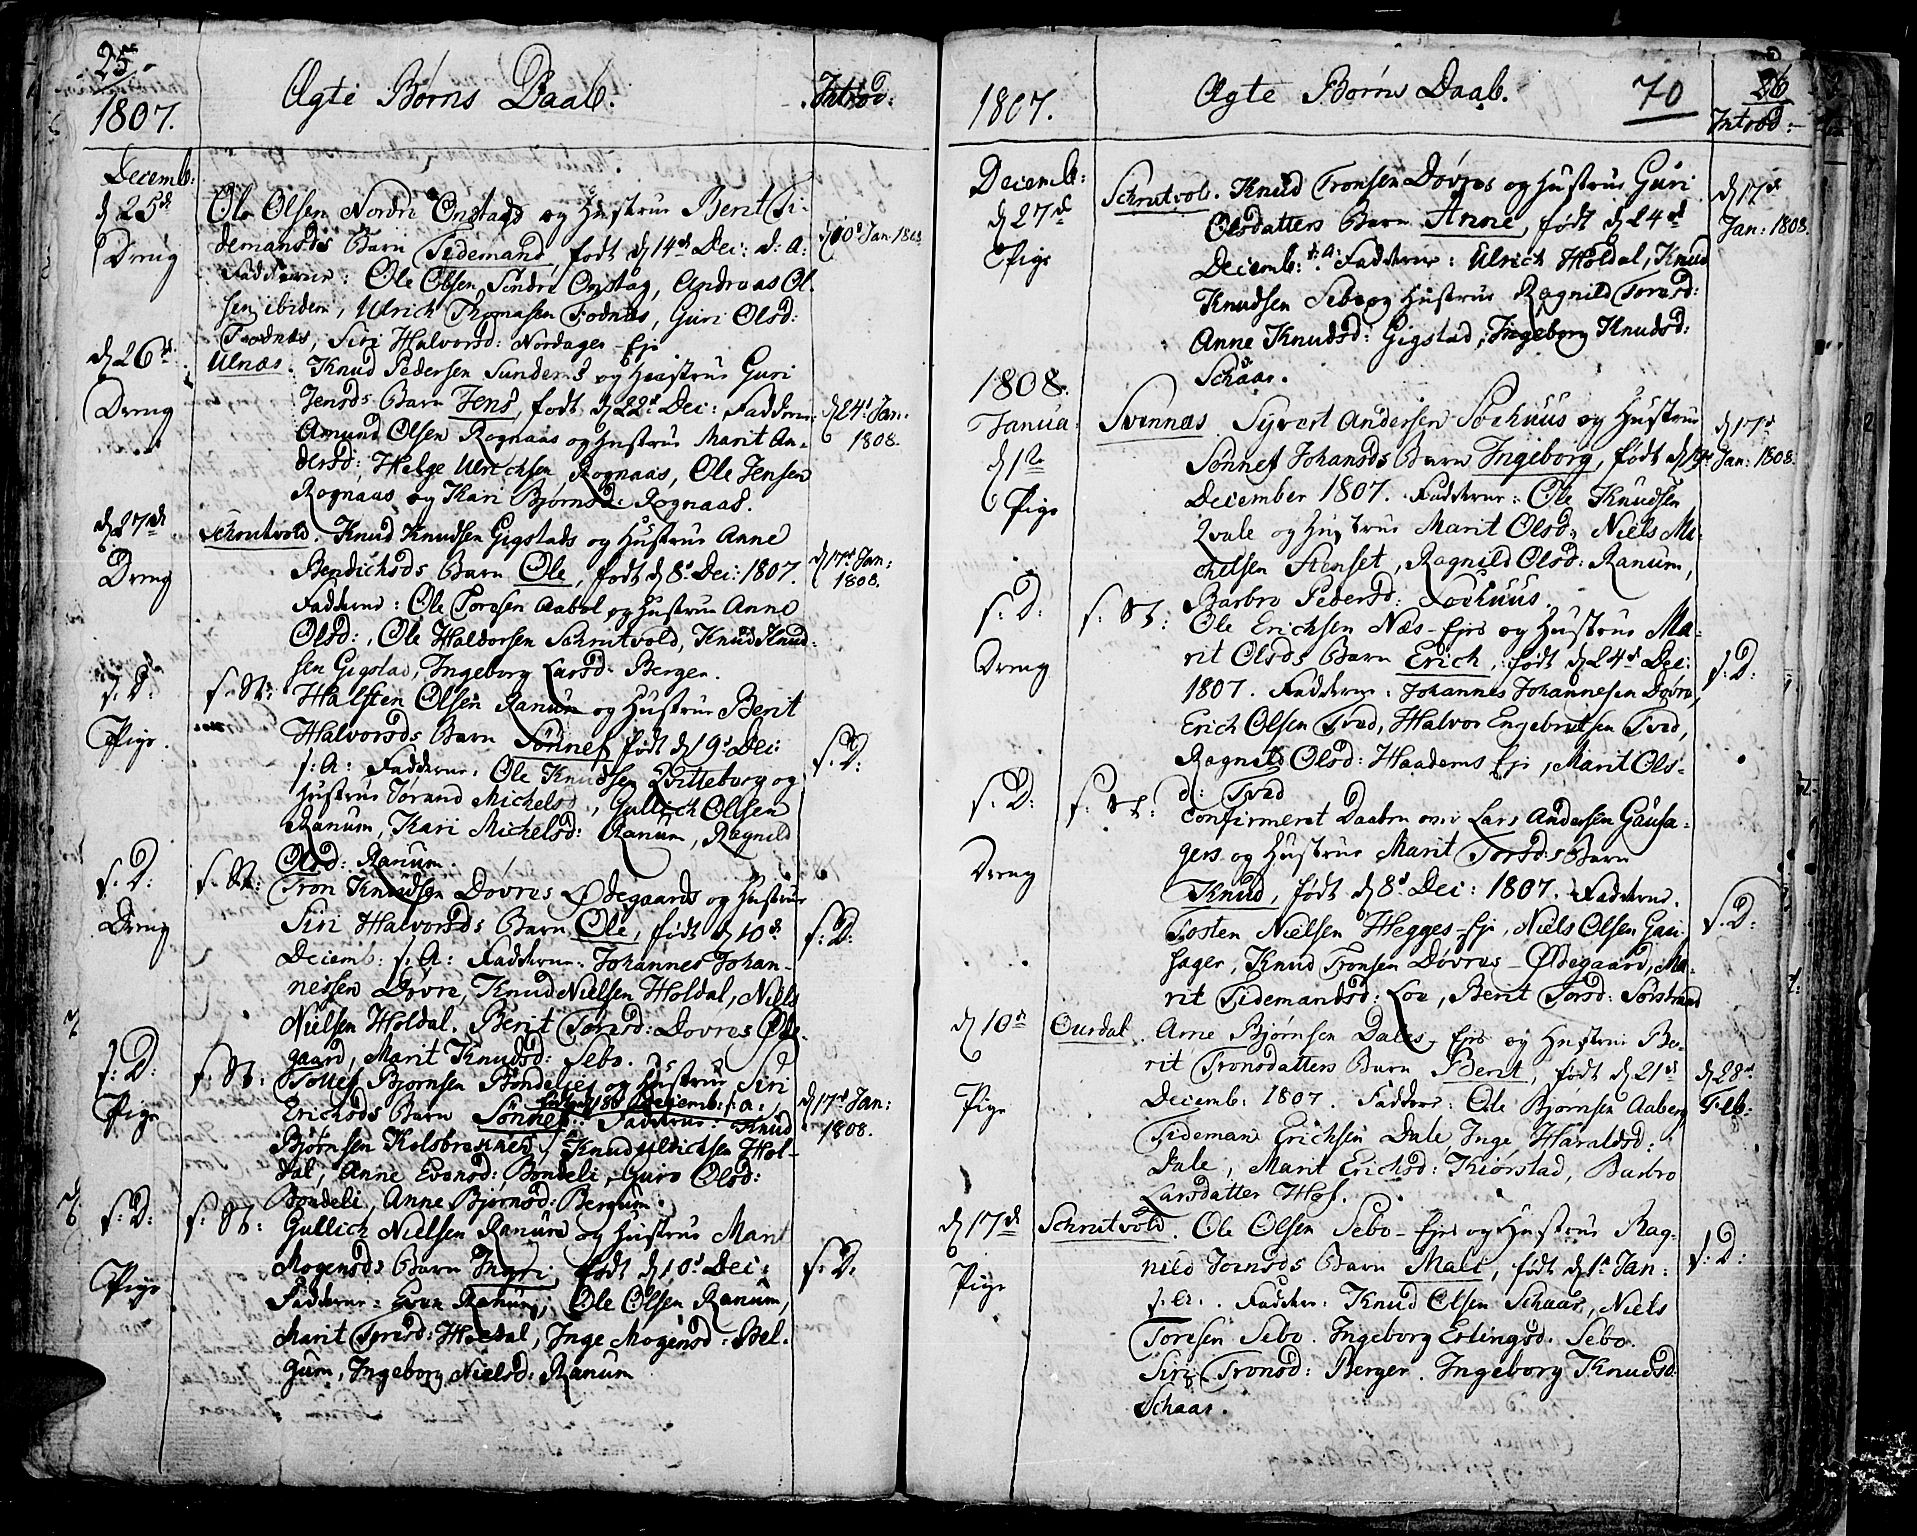 SAH, Aurdal prestekontor, Ministerialbok nr. 7, 1800-1808, s. 70